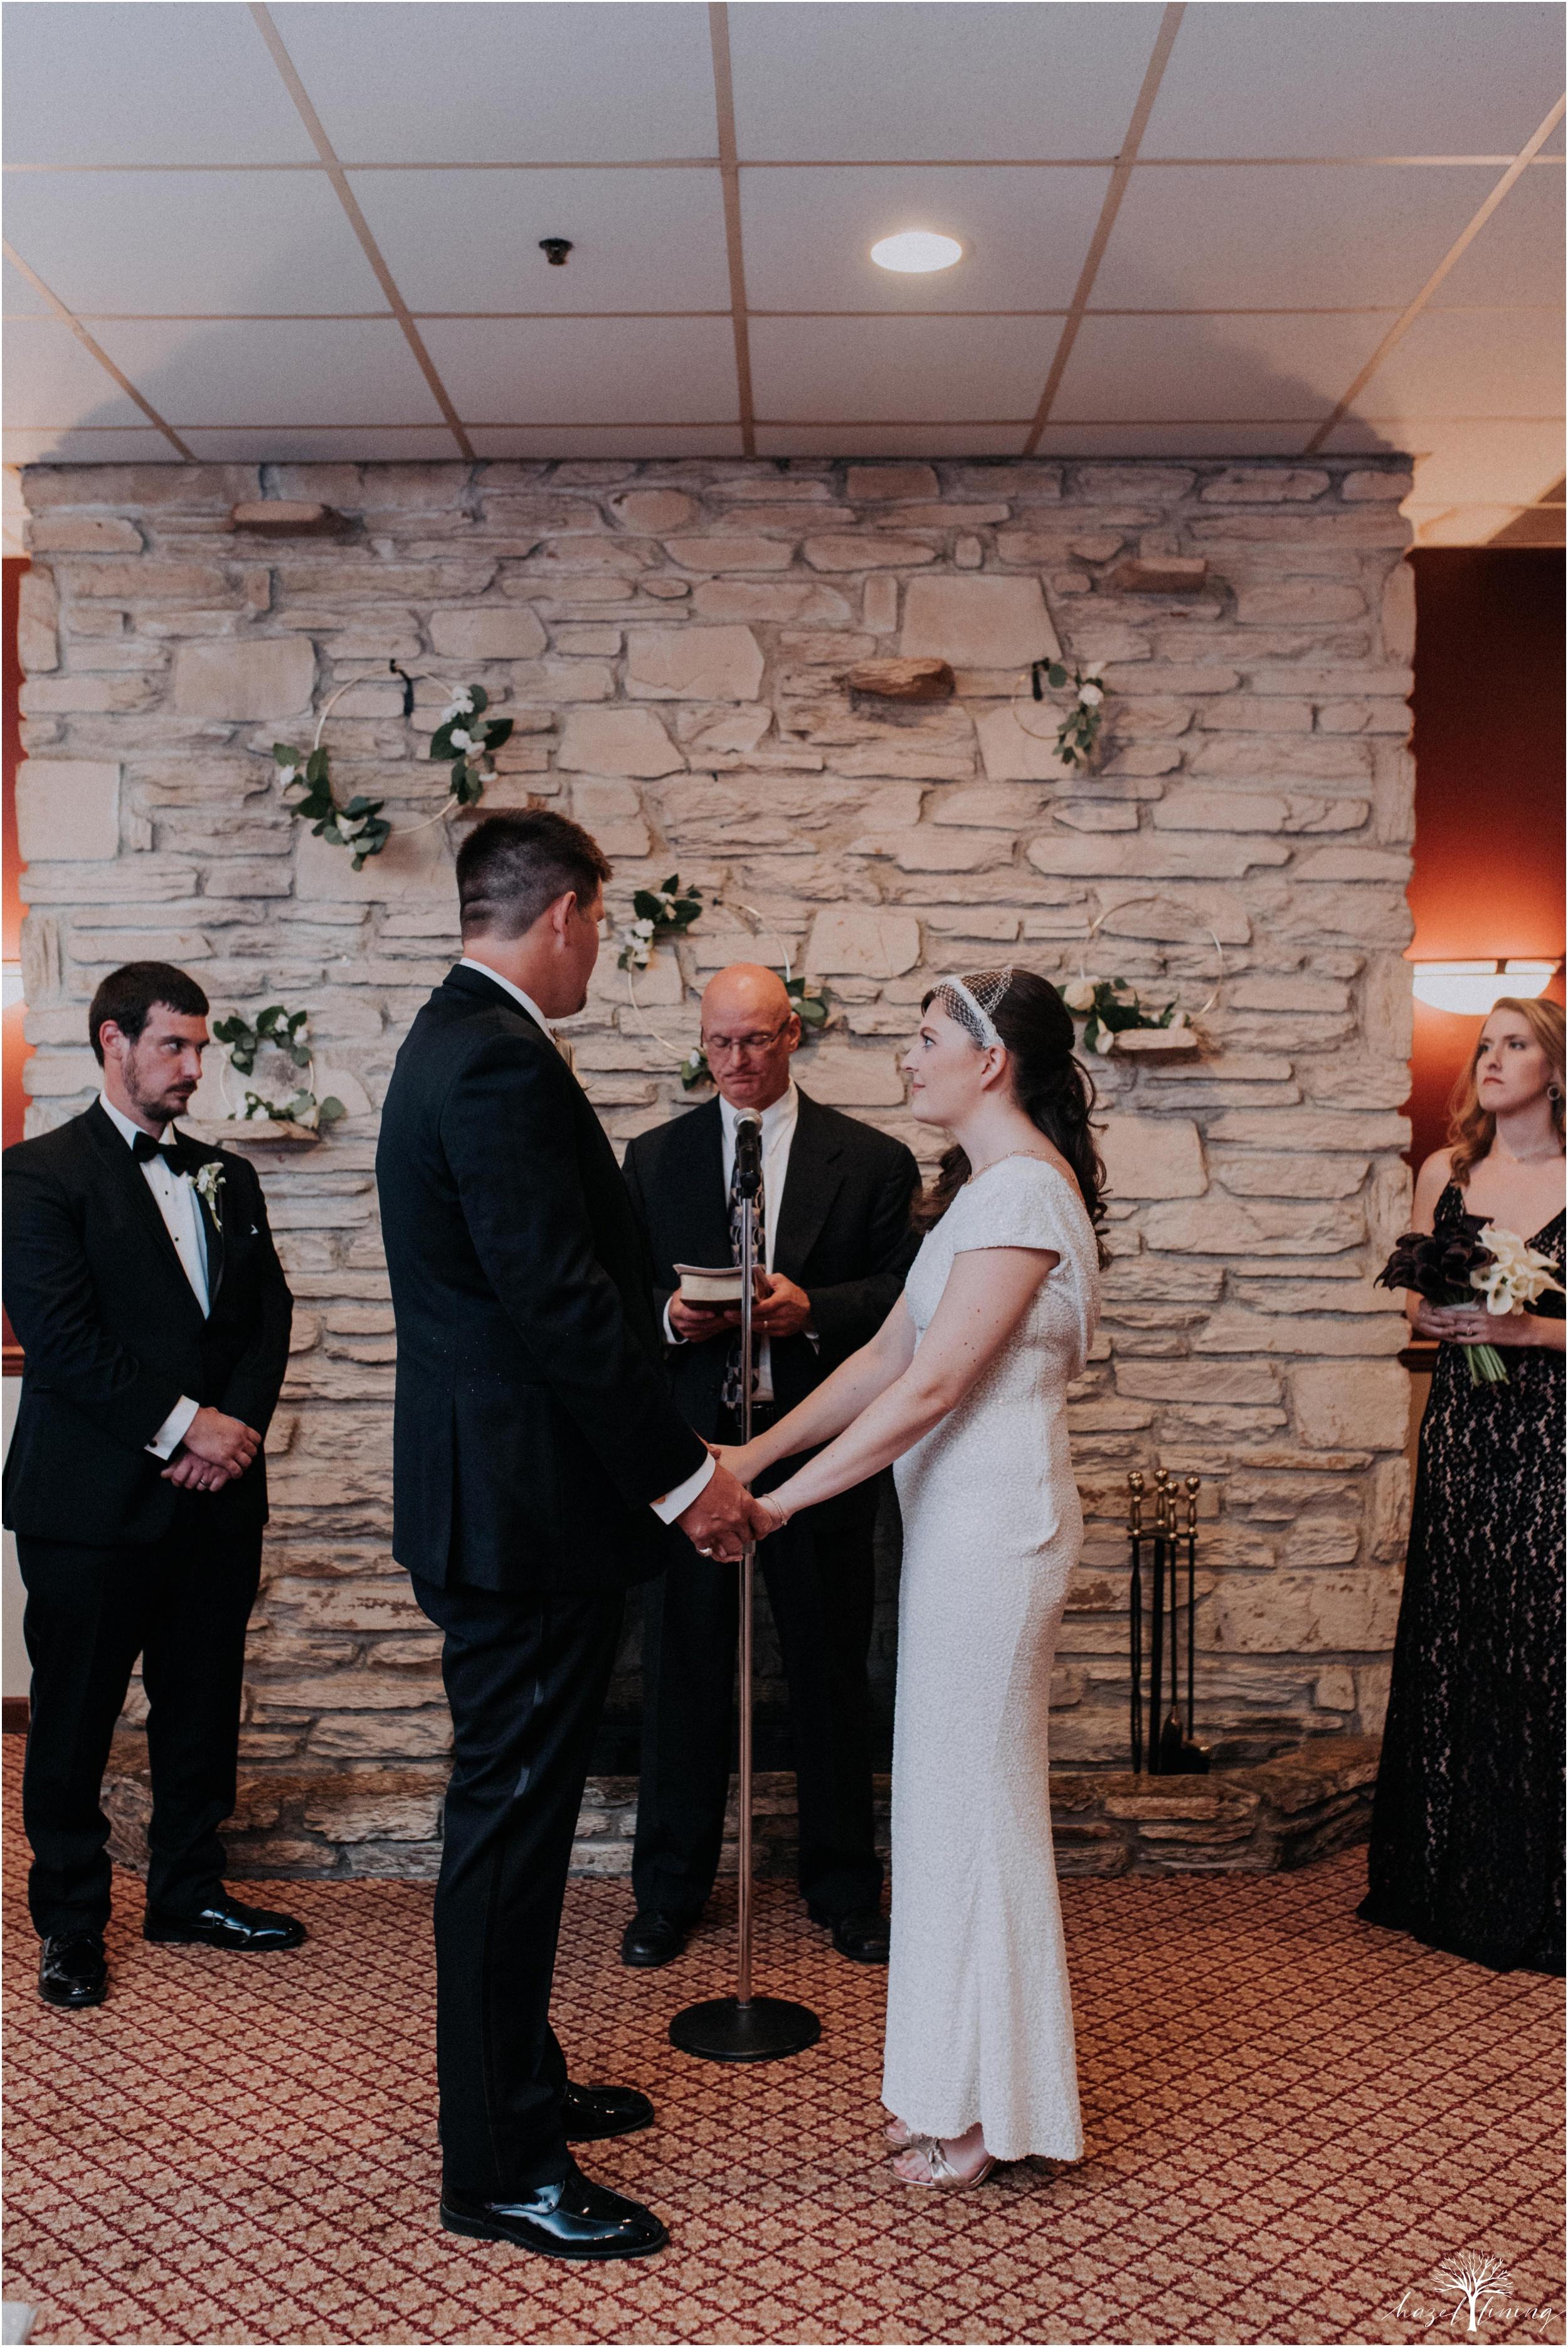 elizabeth-doelp-andrew-foreback-middletown-country-club-summer-langhorne-pennsylvania-wedding-hazel-lining-travel-wedding-elopement-photography_0113.jpg